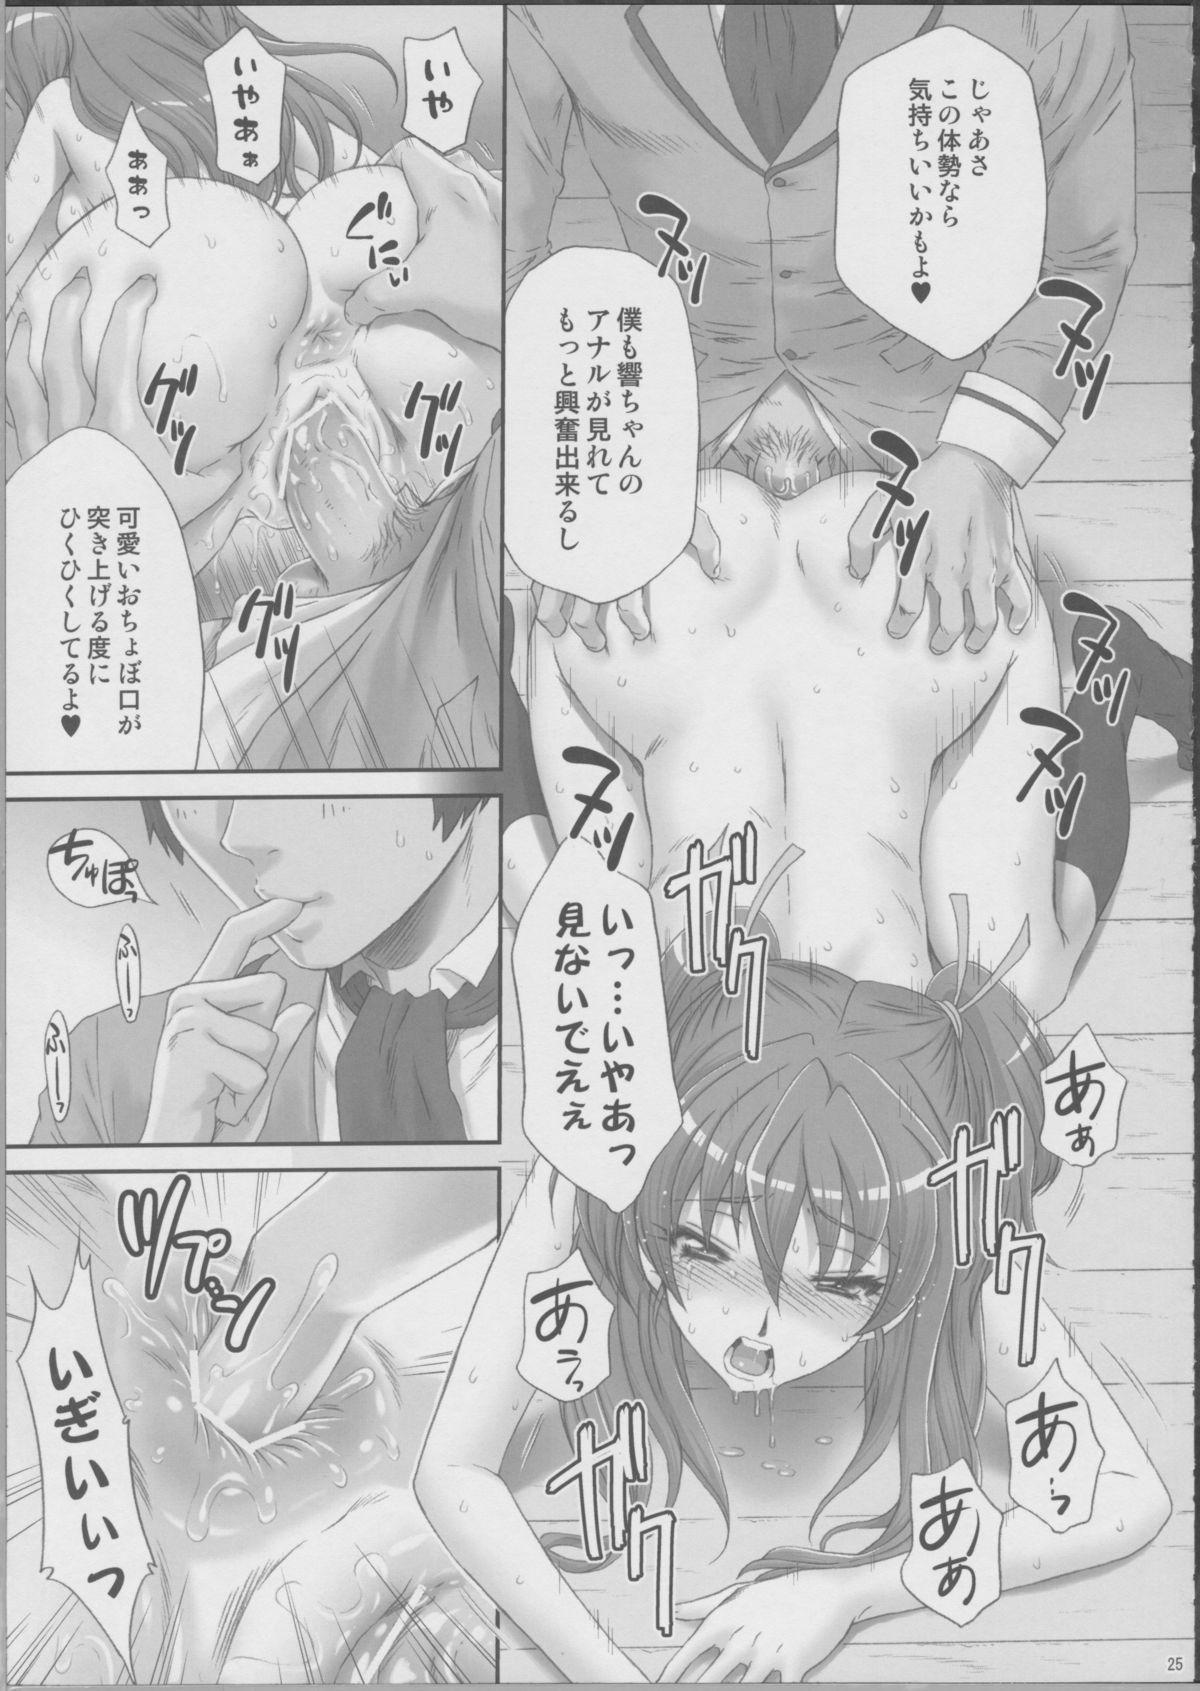 Hibiki de asobou ♪ 23